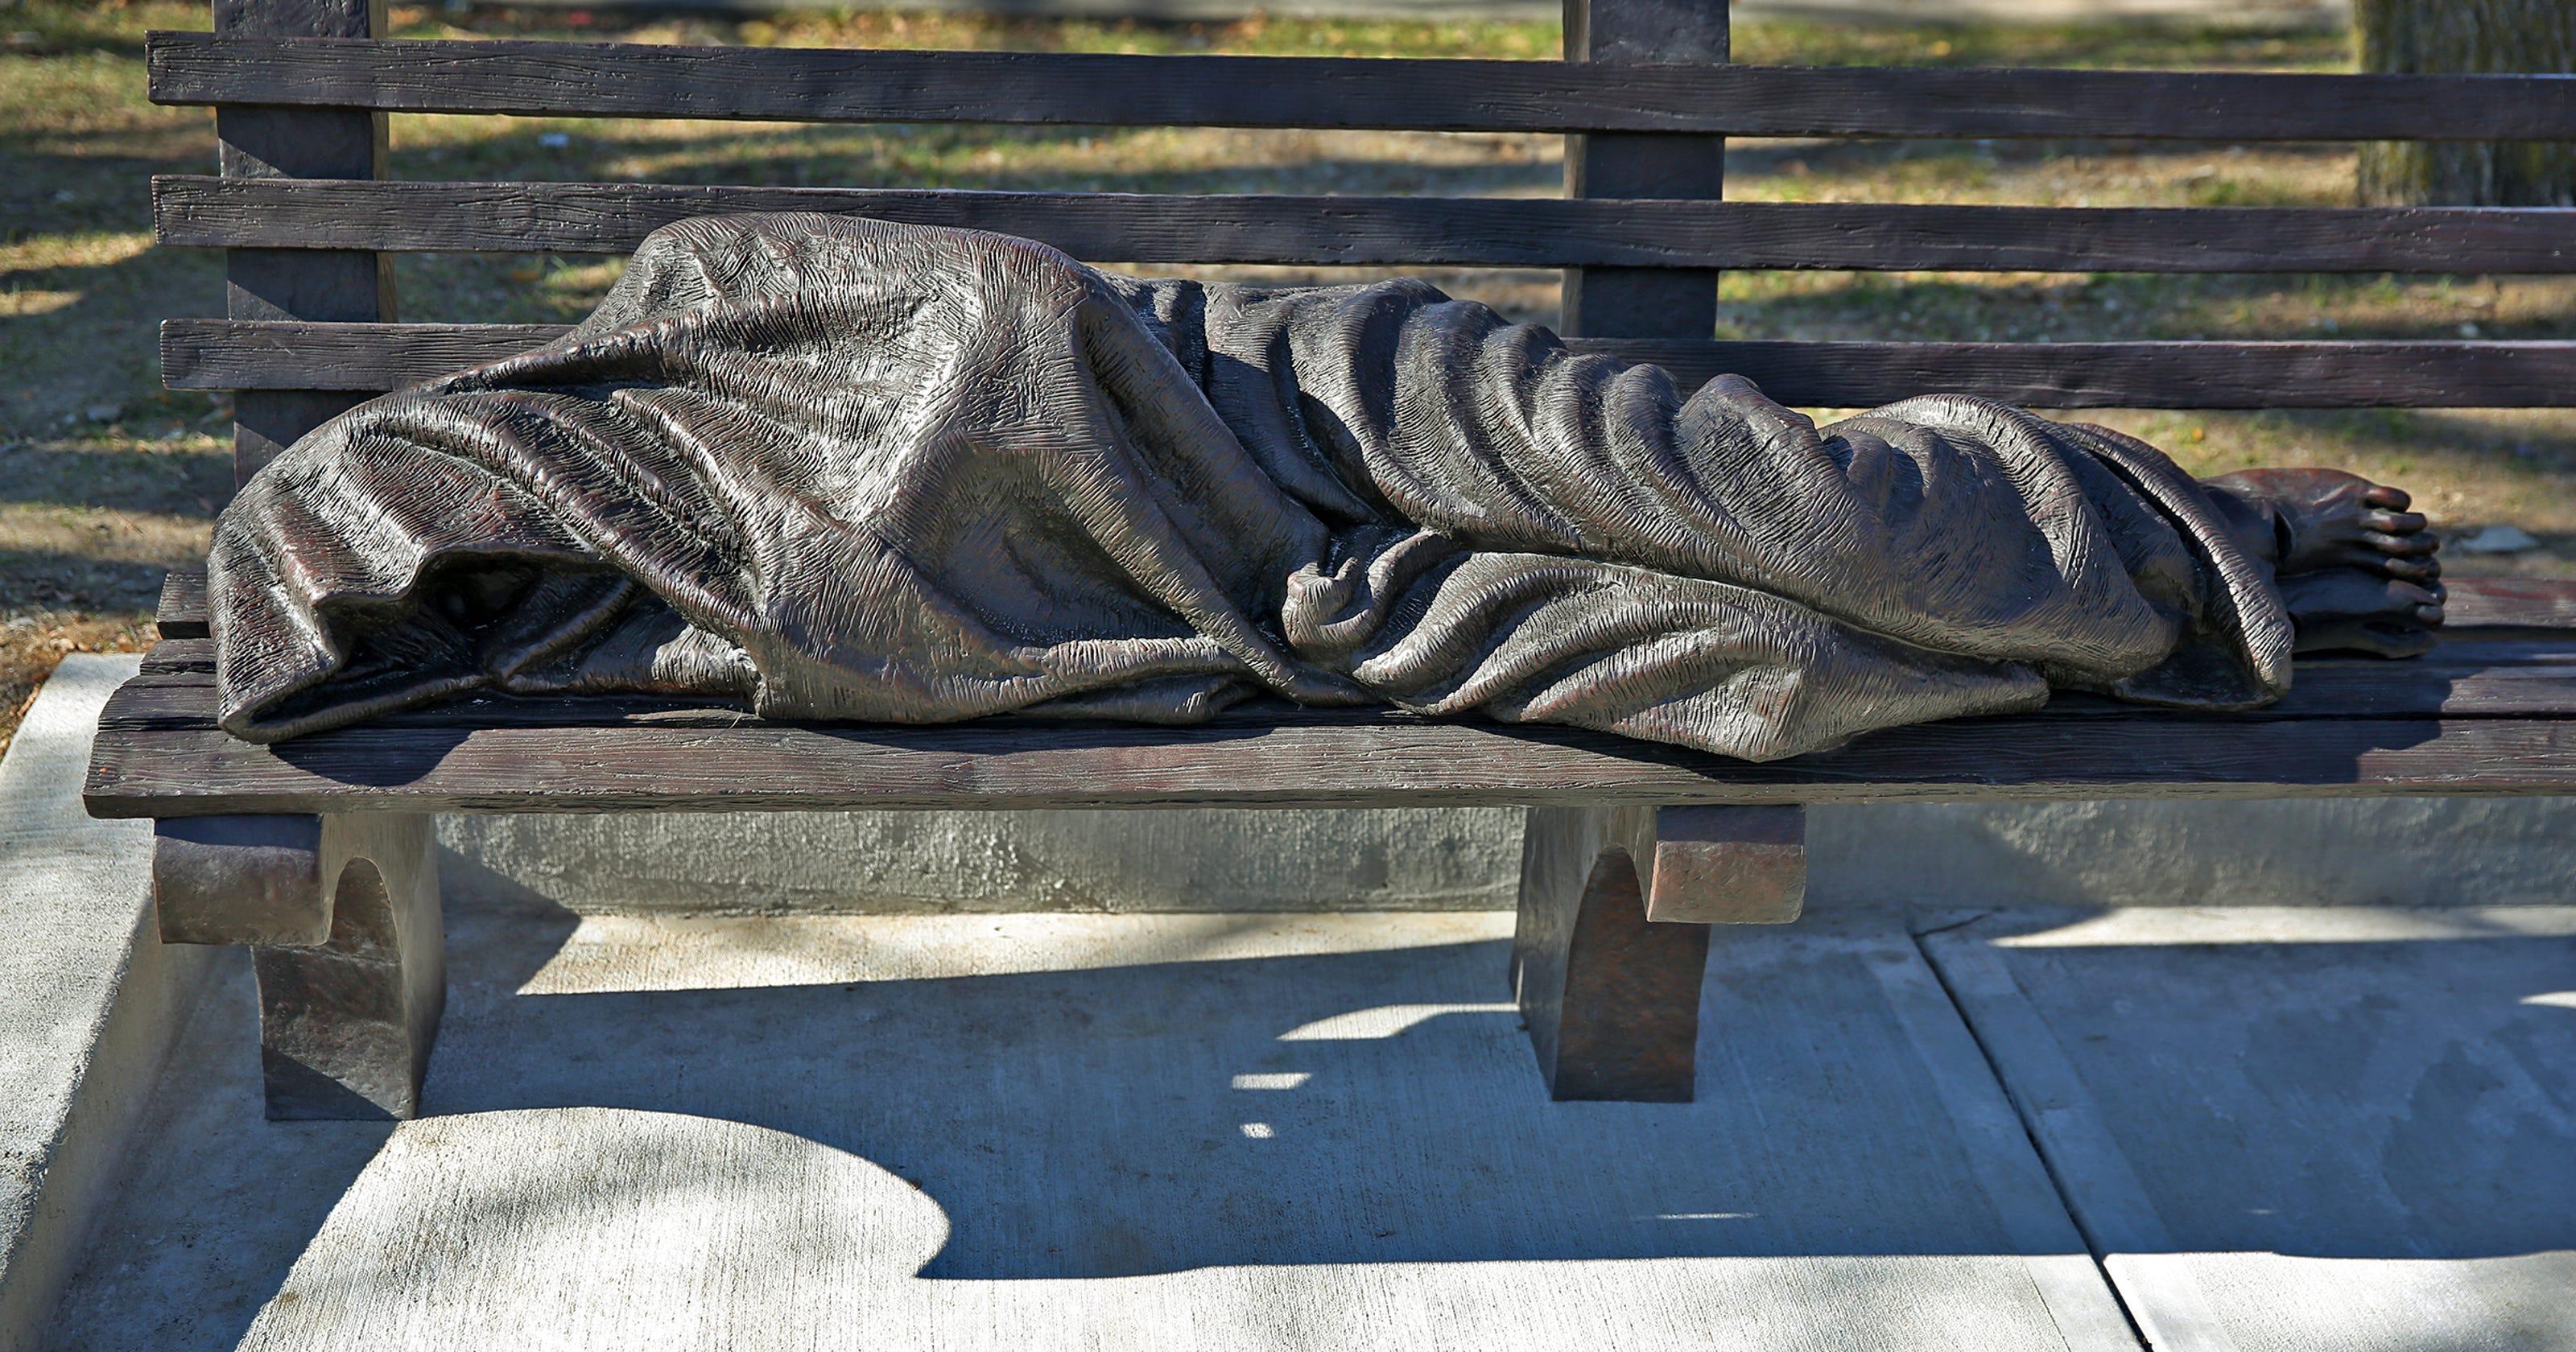 40 000 Homeless Jesus Invites Debate